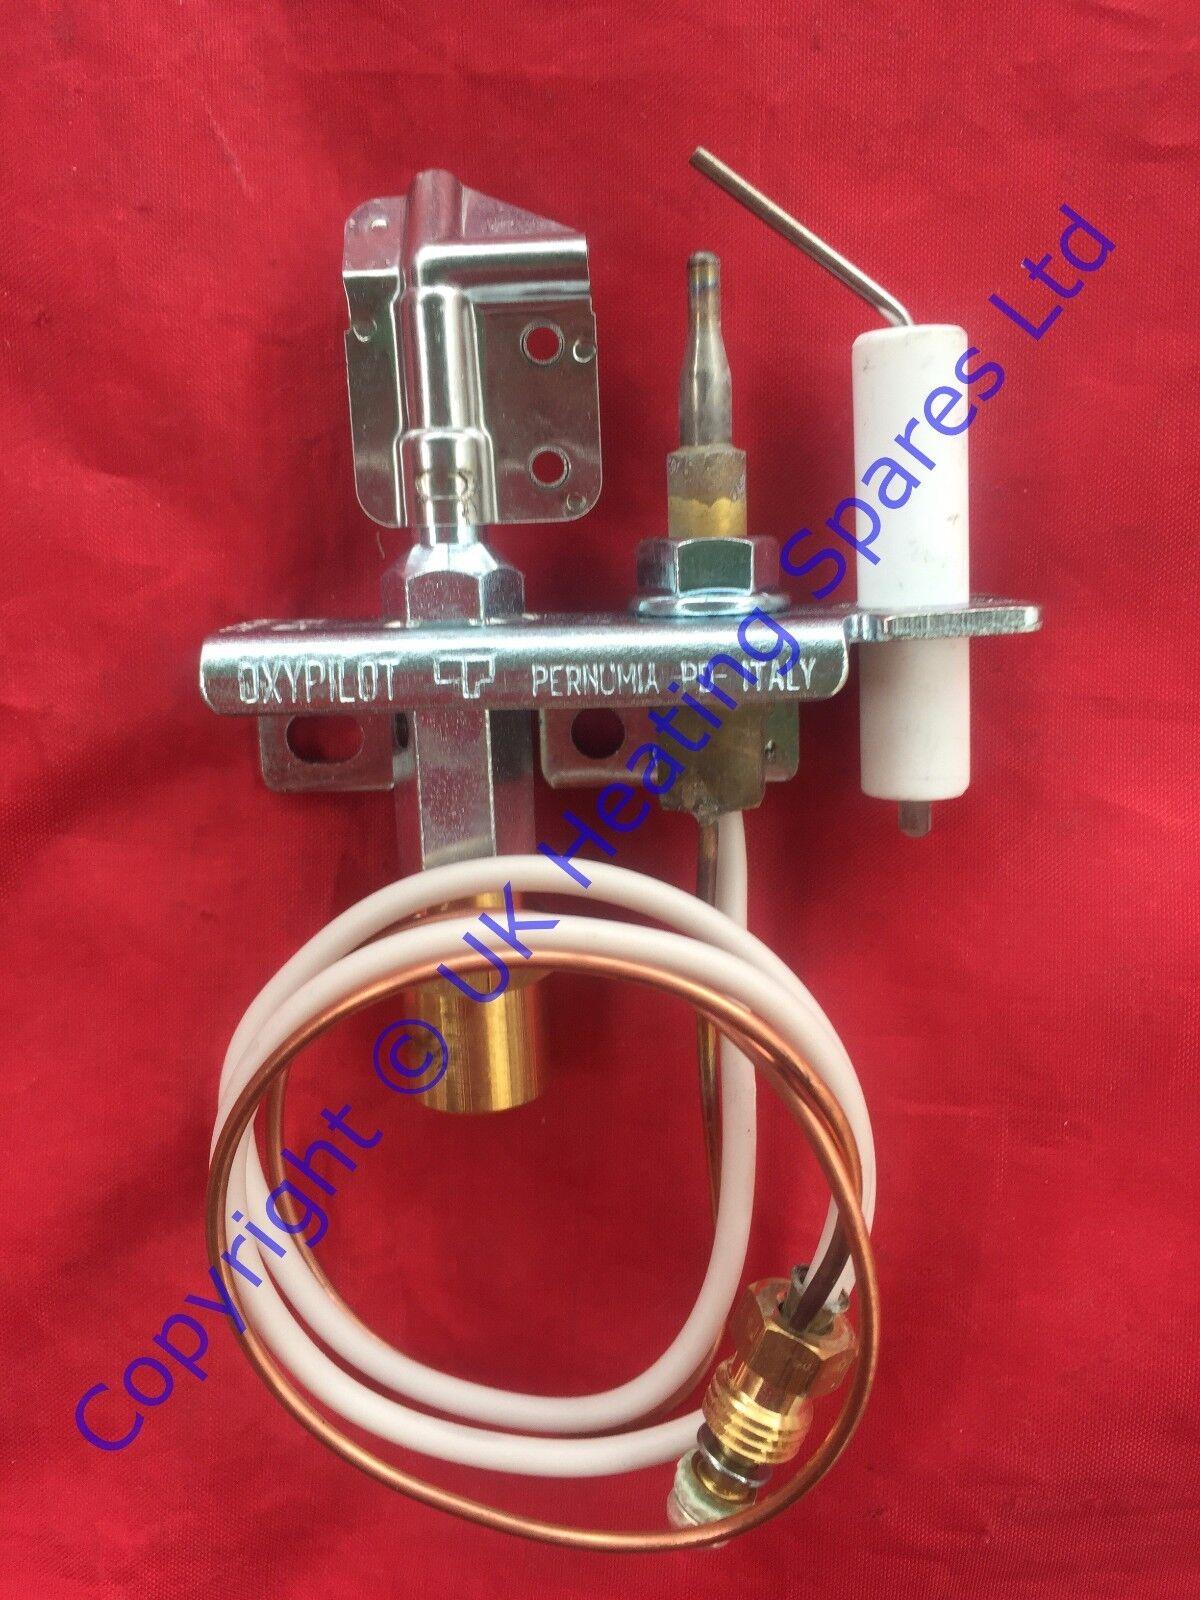 Global Corde Charbon PF NG Pédale oxypilot thermocouple électrode b1350 ng9022